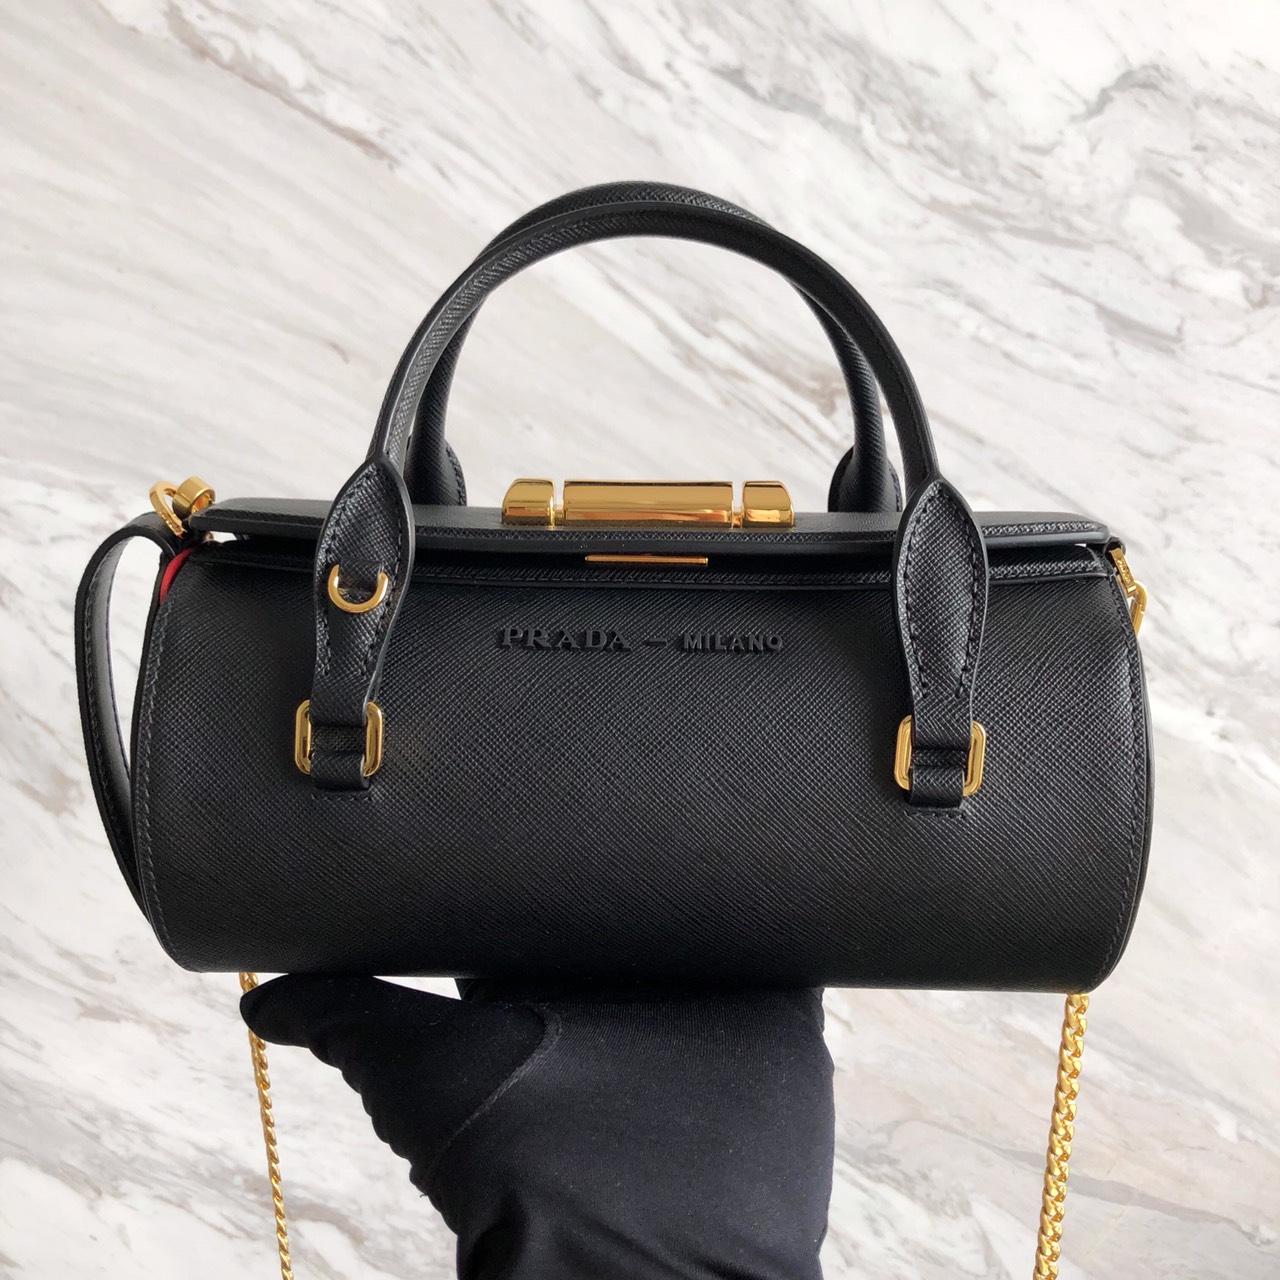 P家最新款Sybille Saffiano手袋1BA216 简约的迷你手袋颇具现代魅力 同色logo更显独特品味